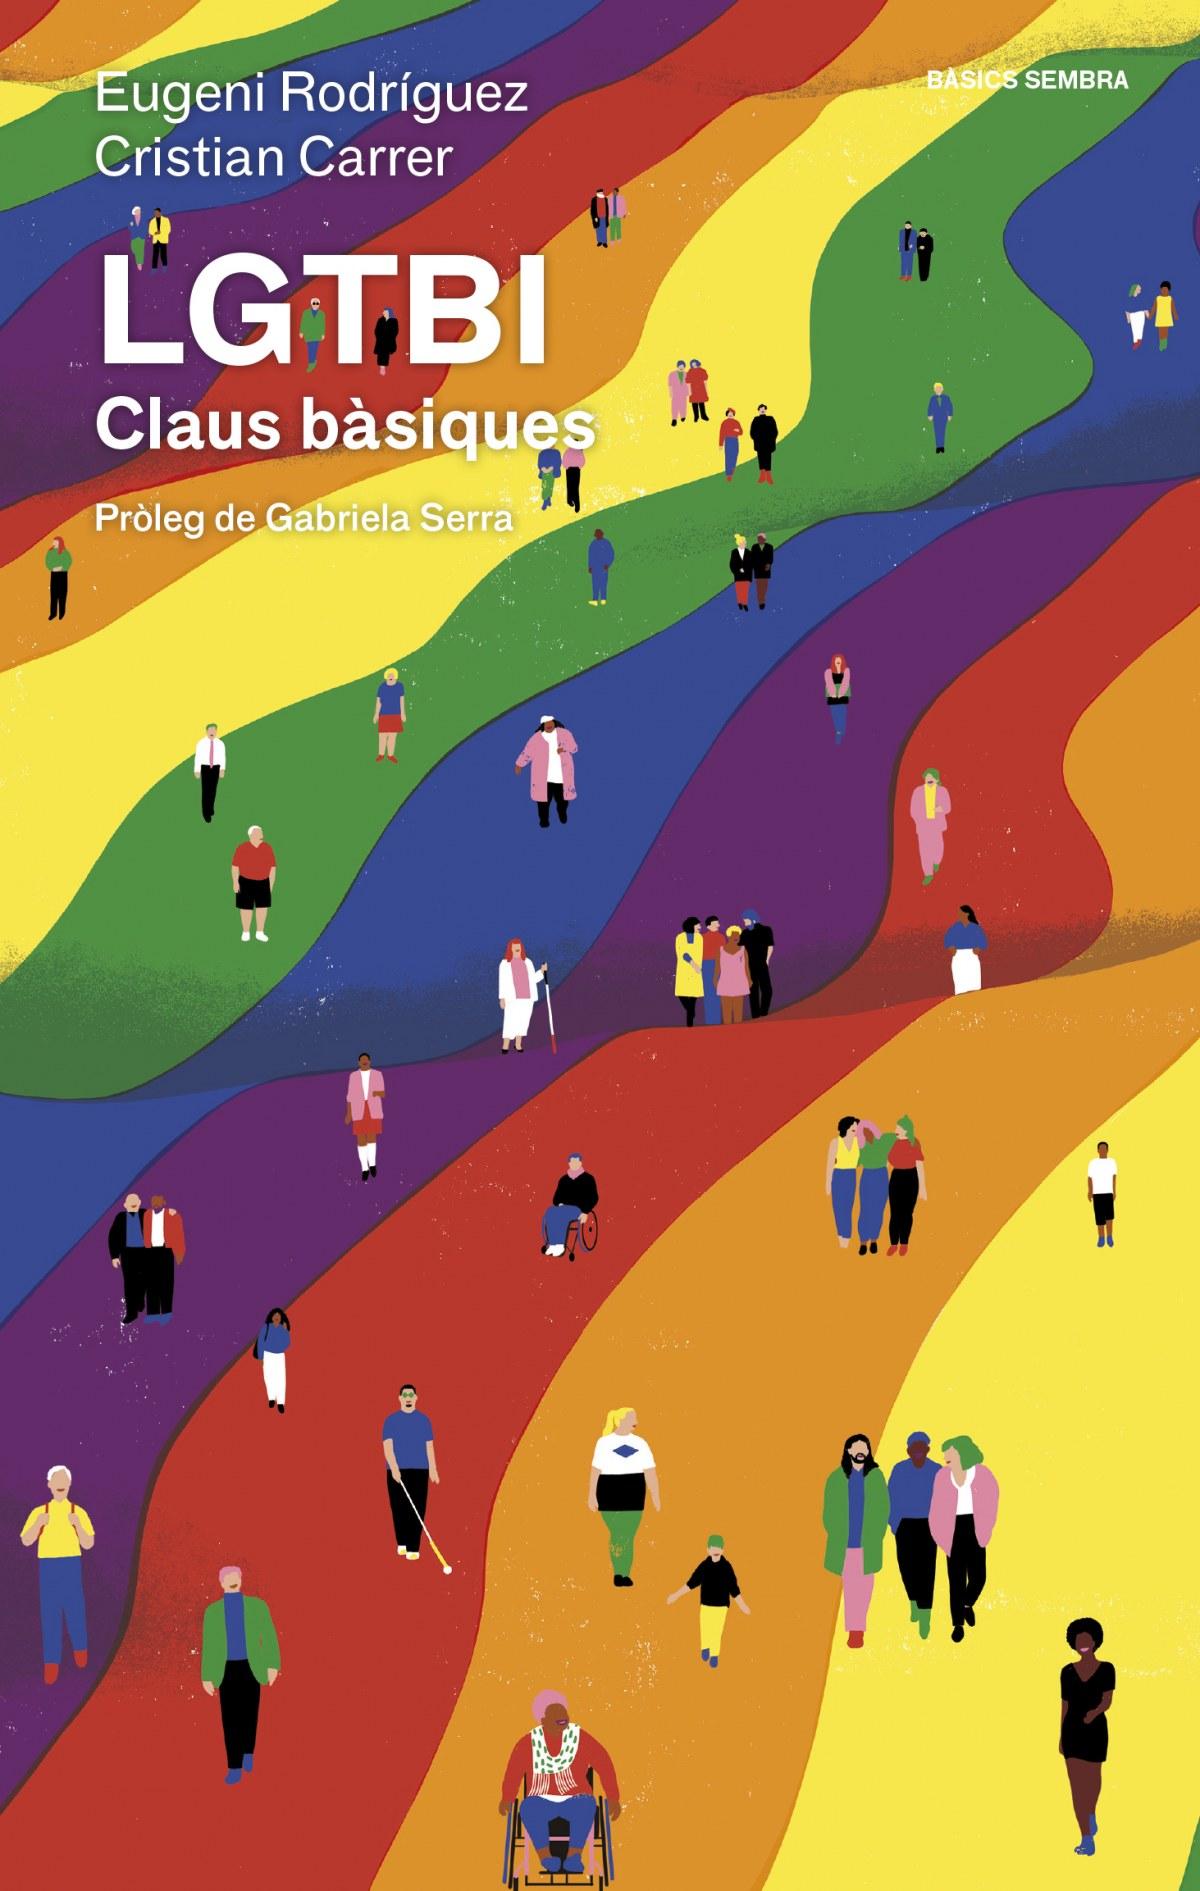 LGTBI CLAUS BASIQUES